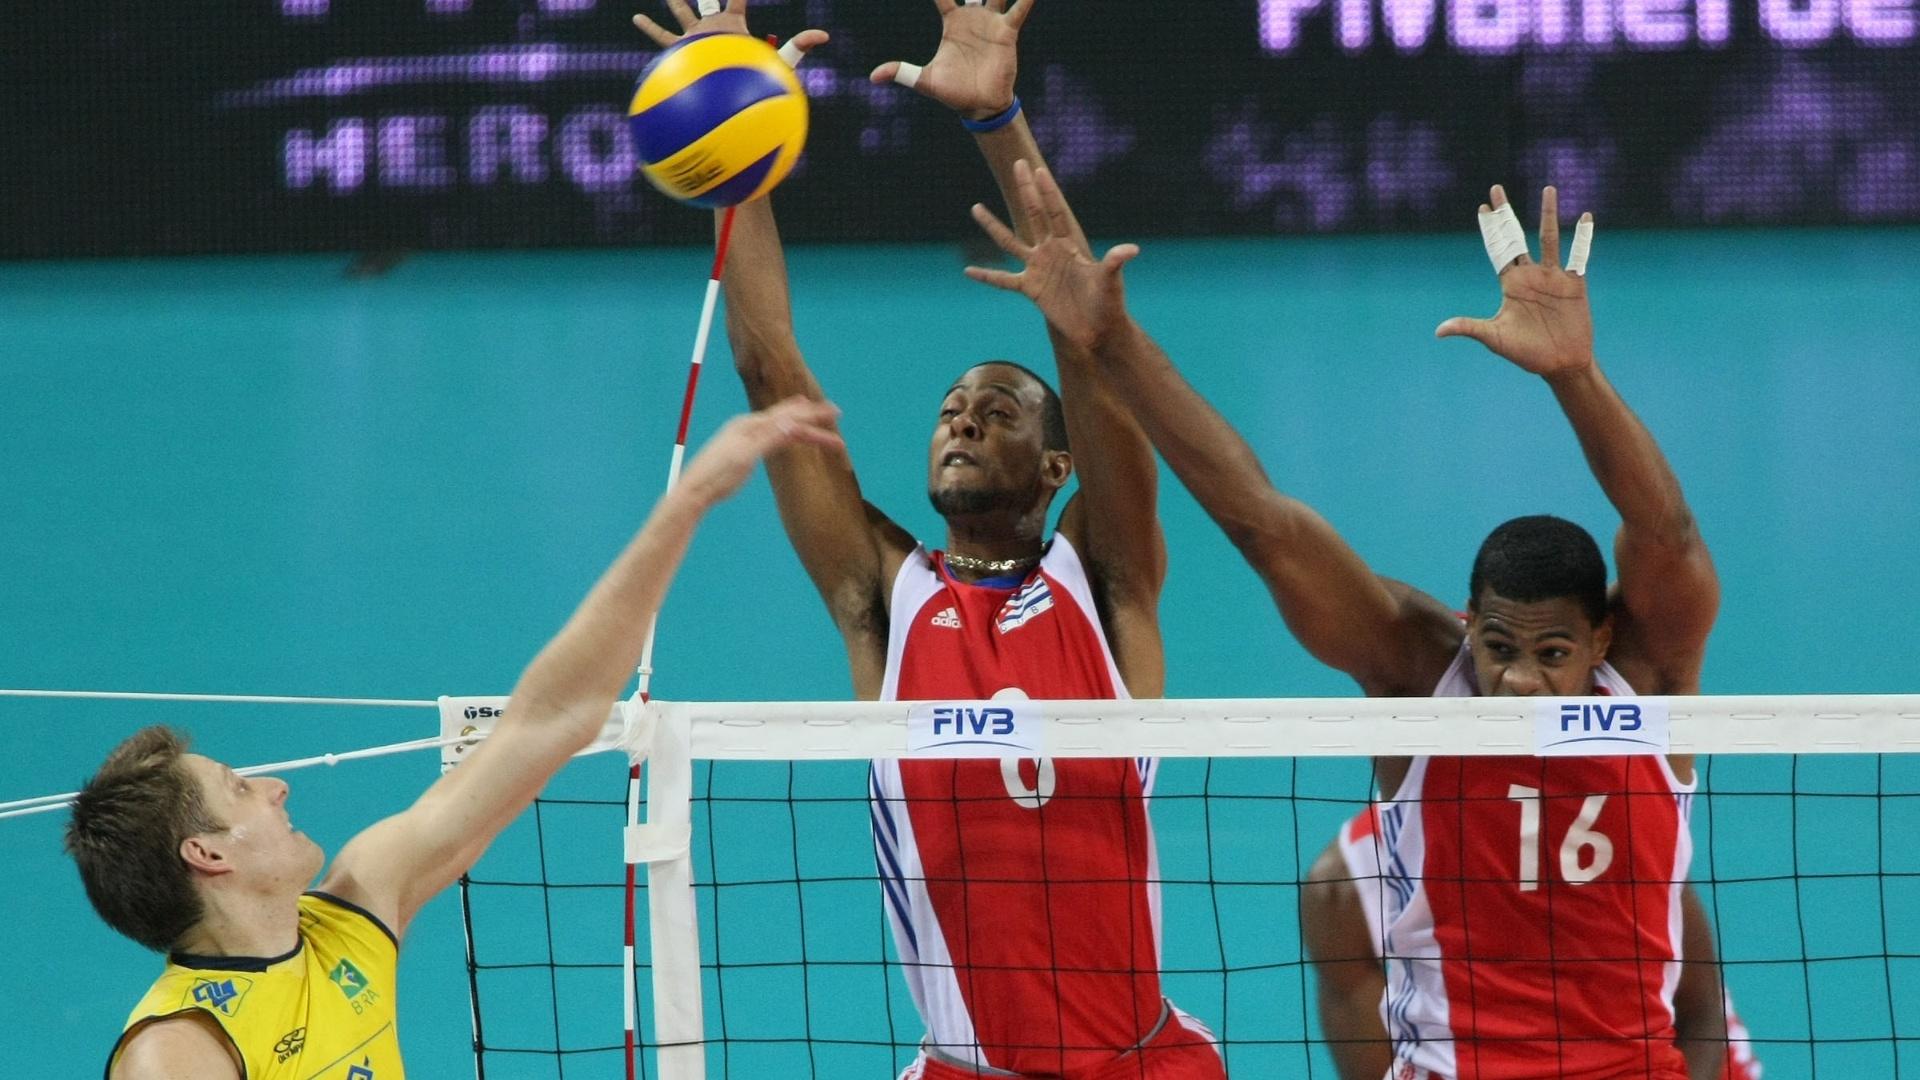 Murilo para no bloqueio de Cuba na estreia do time na fase final da Liga Mundial